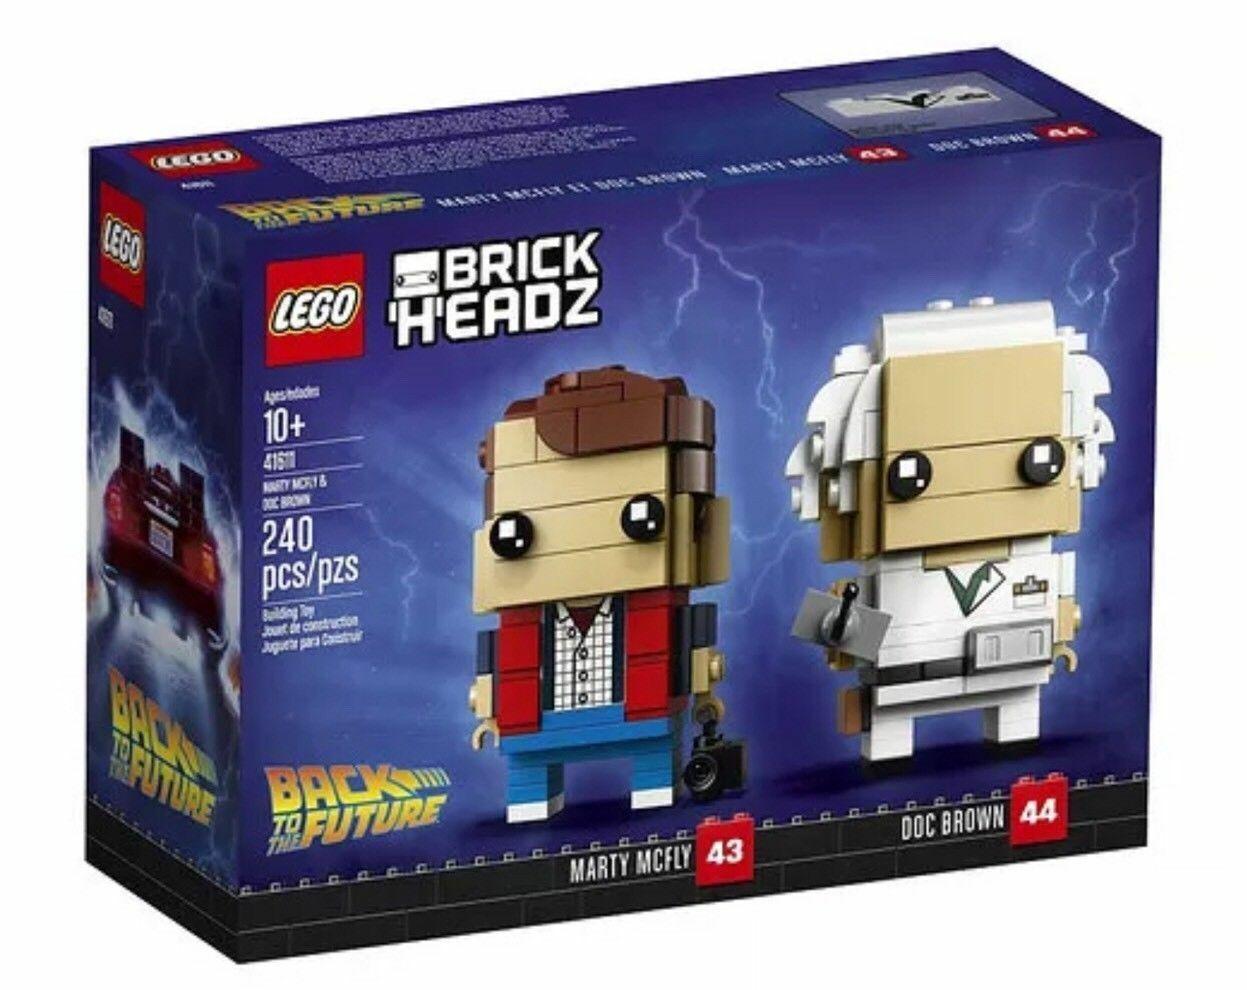 LEGO - 41611 BrickHeadz Marty McFly and Doc braun Back to the Future Set